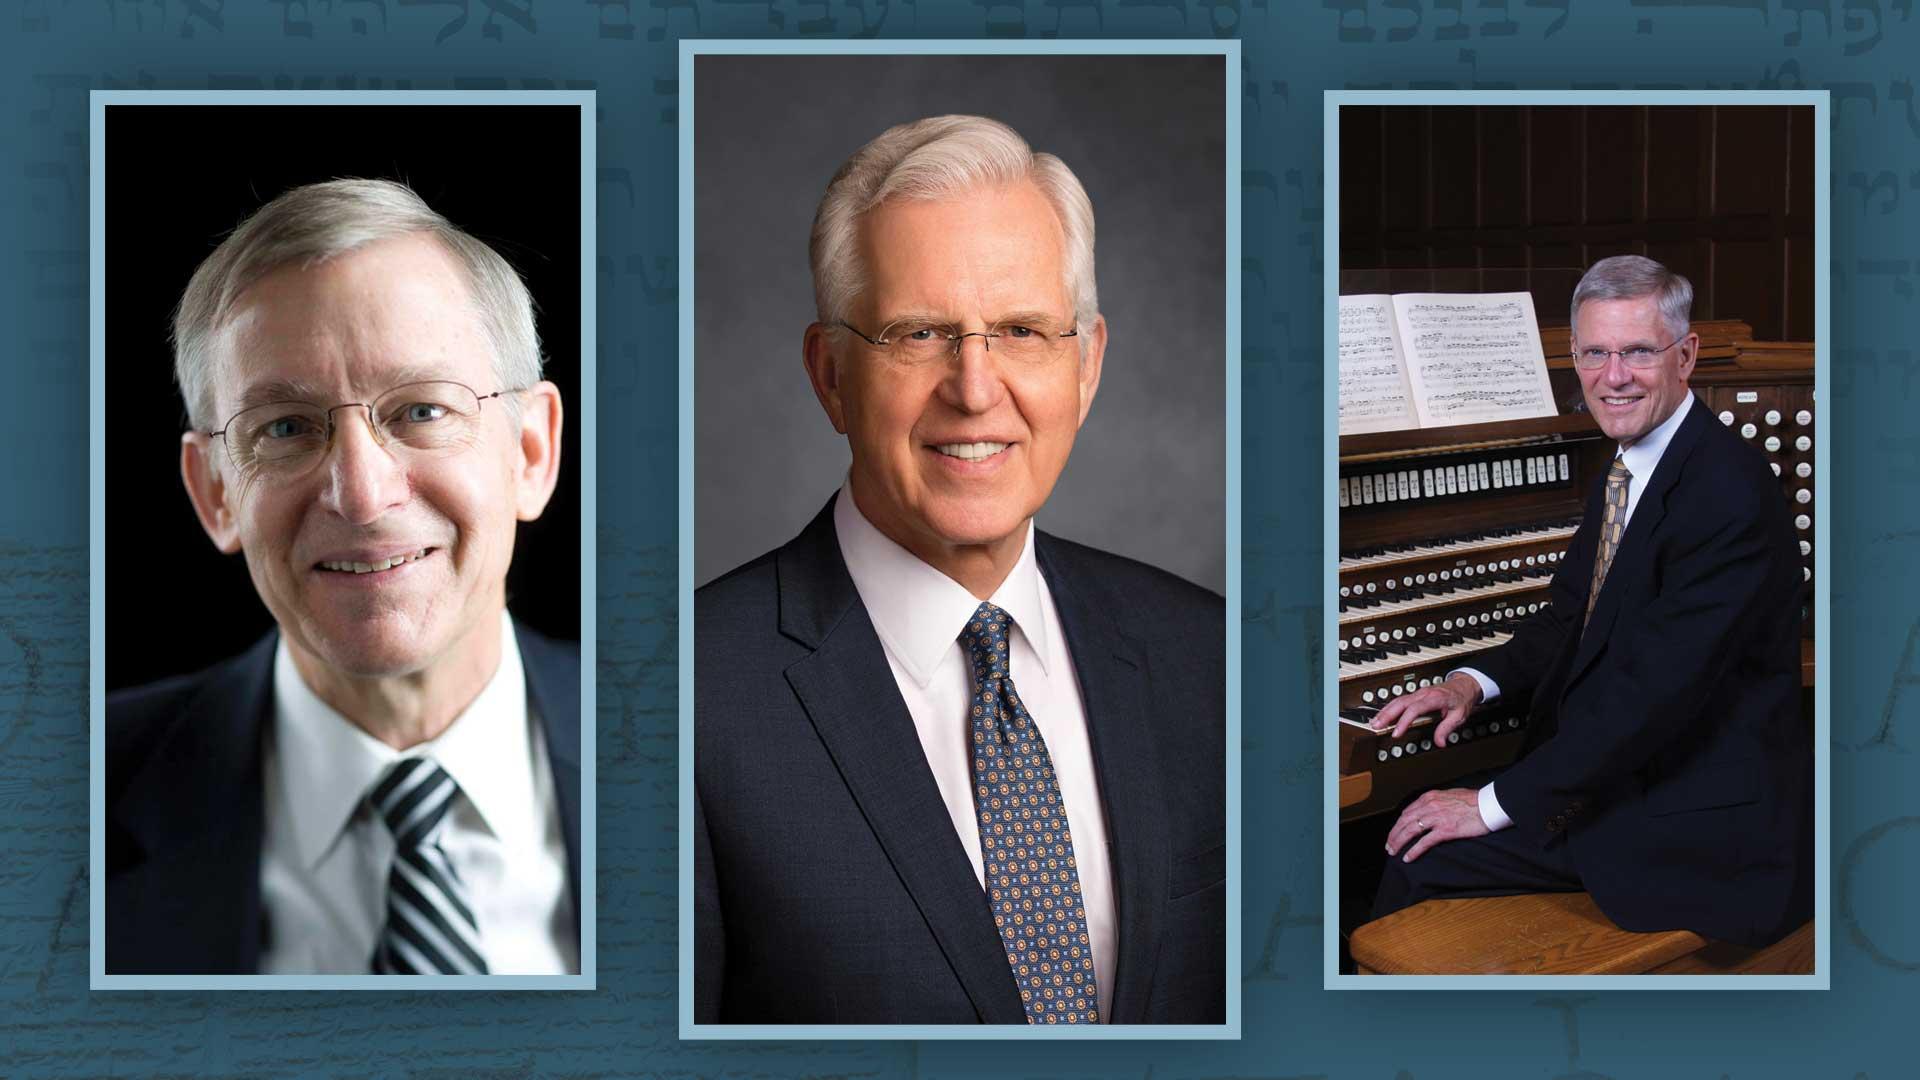 Musical Fireside featuring D. Todd Christofferson, John W. Welch, and James B. Welch.